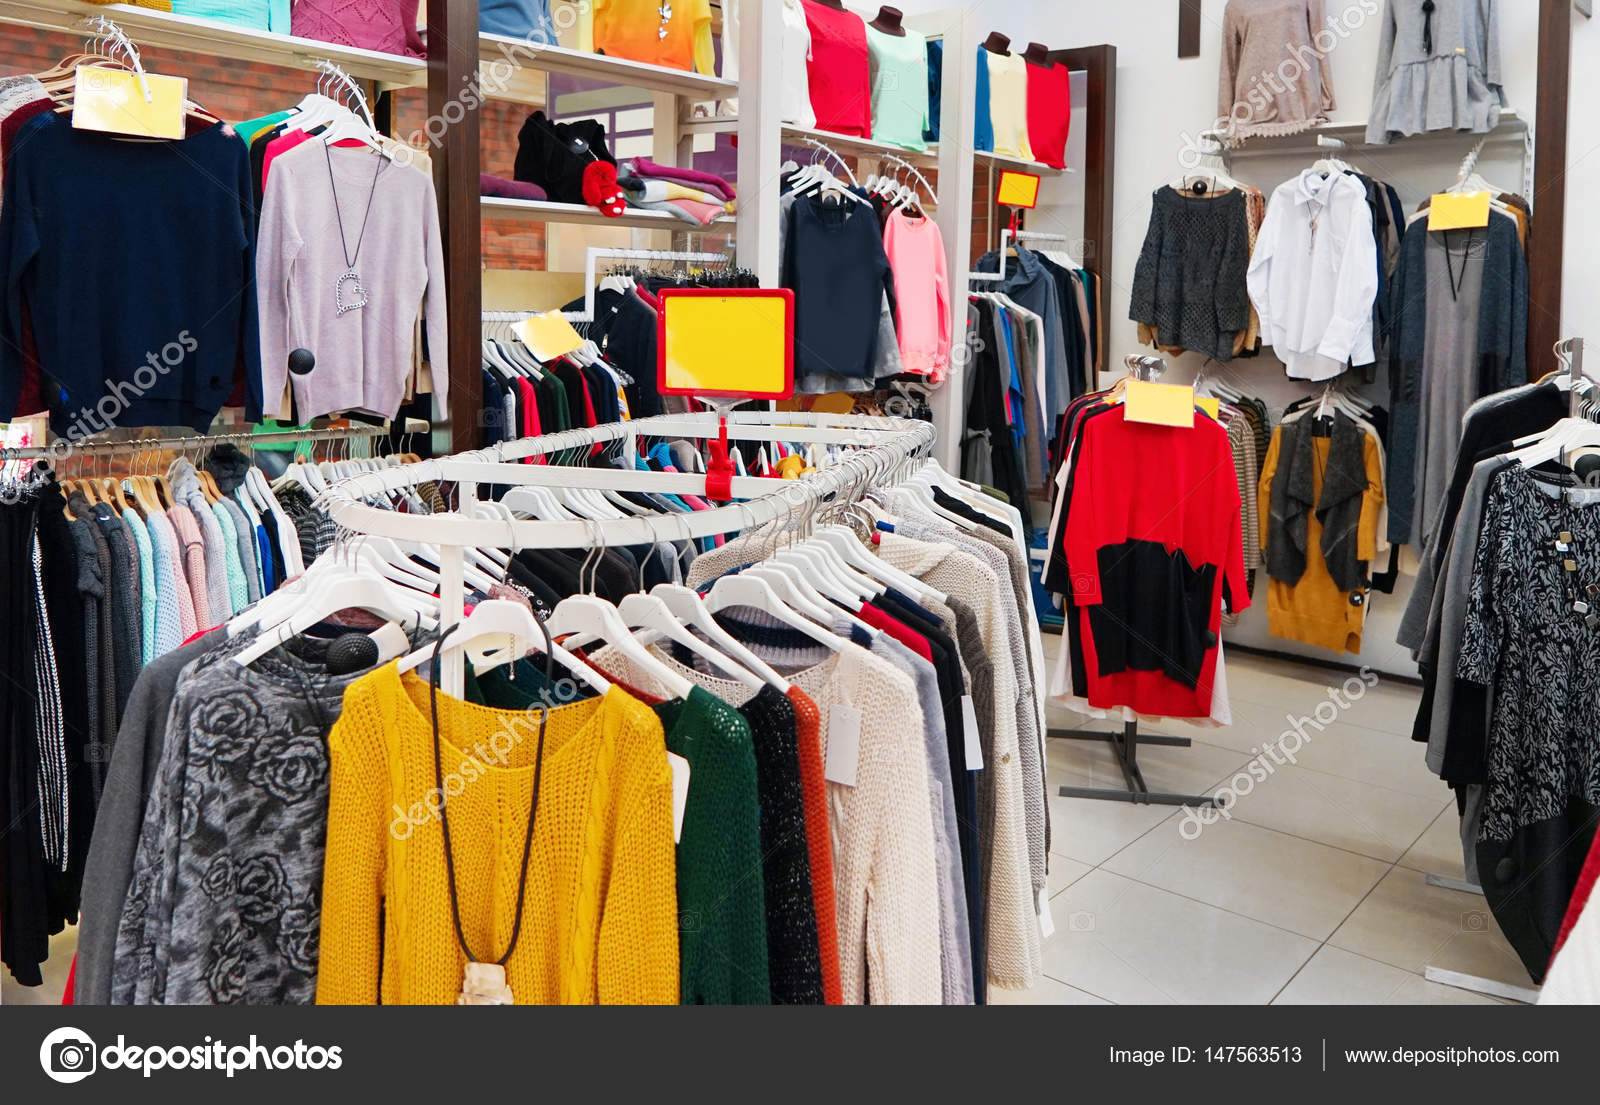 e9086bbd77a9 ρούχα σε σύγχρονη αποθήκη — Φωτογραφία Αρχείου © belchonock  147563513